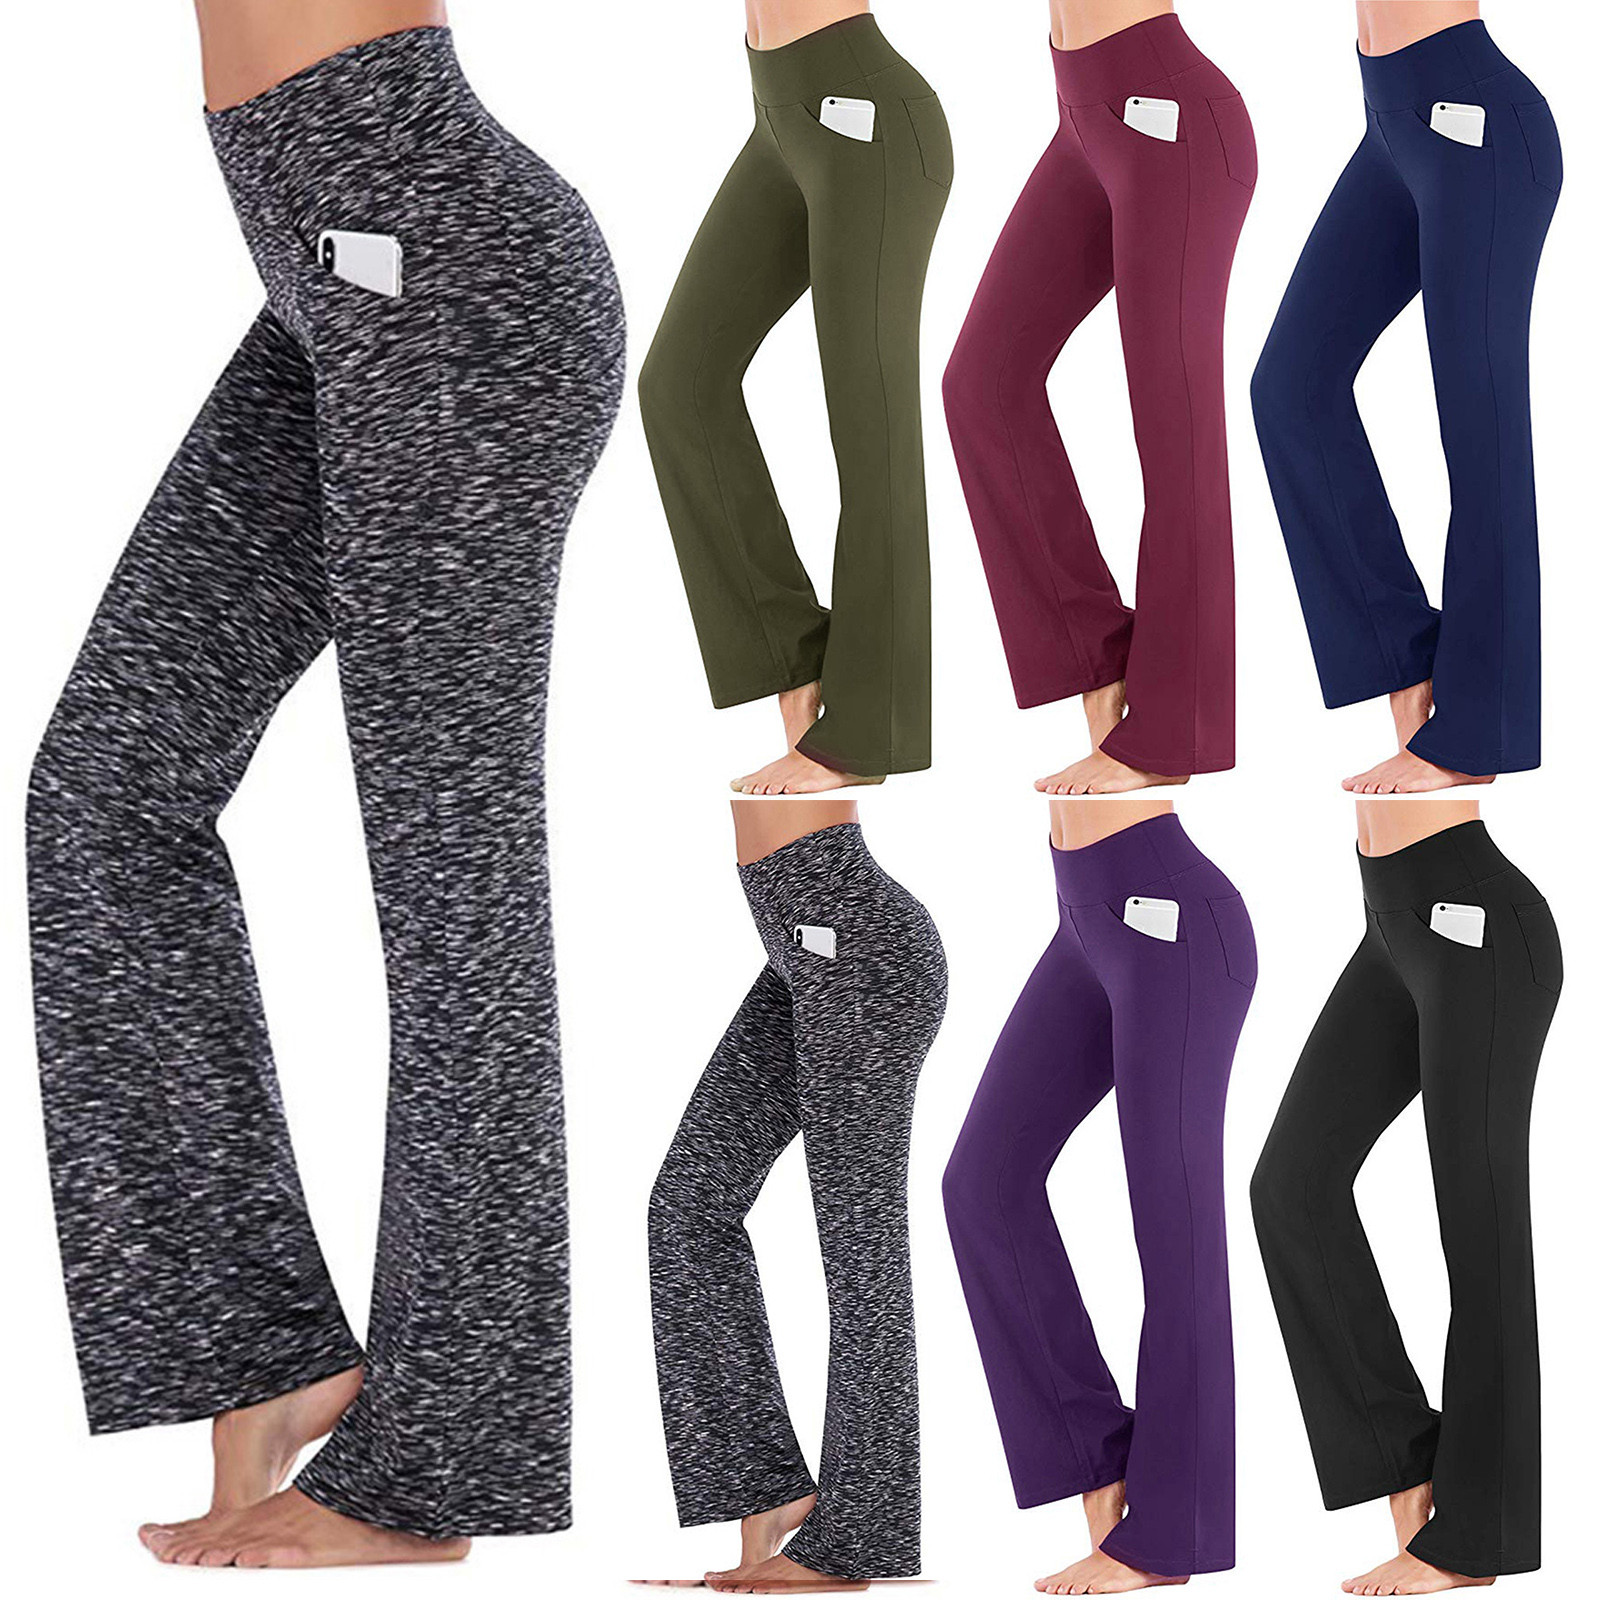 Leggings Women Exercise Running Fitness Push Up High Waist Fashion Workout Slim Leggins Casual Solid pantalones de muje|Leggings| - AliExpress